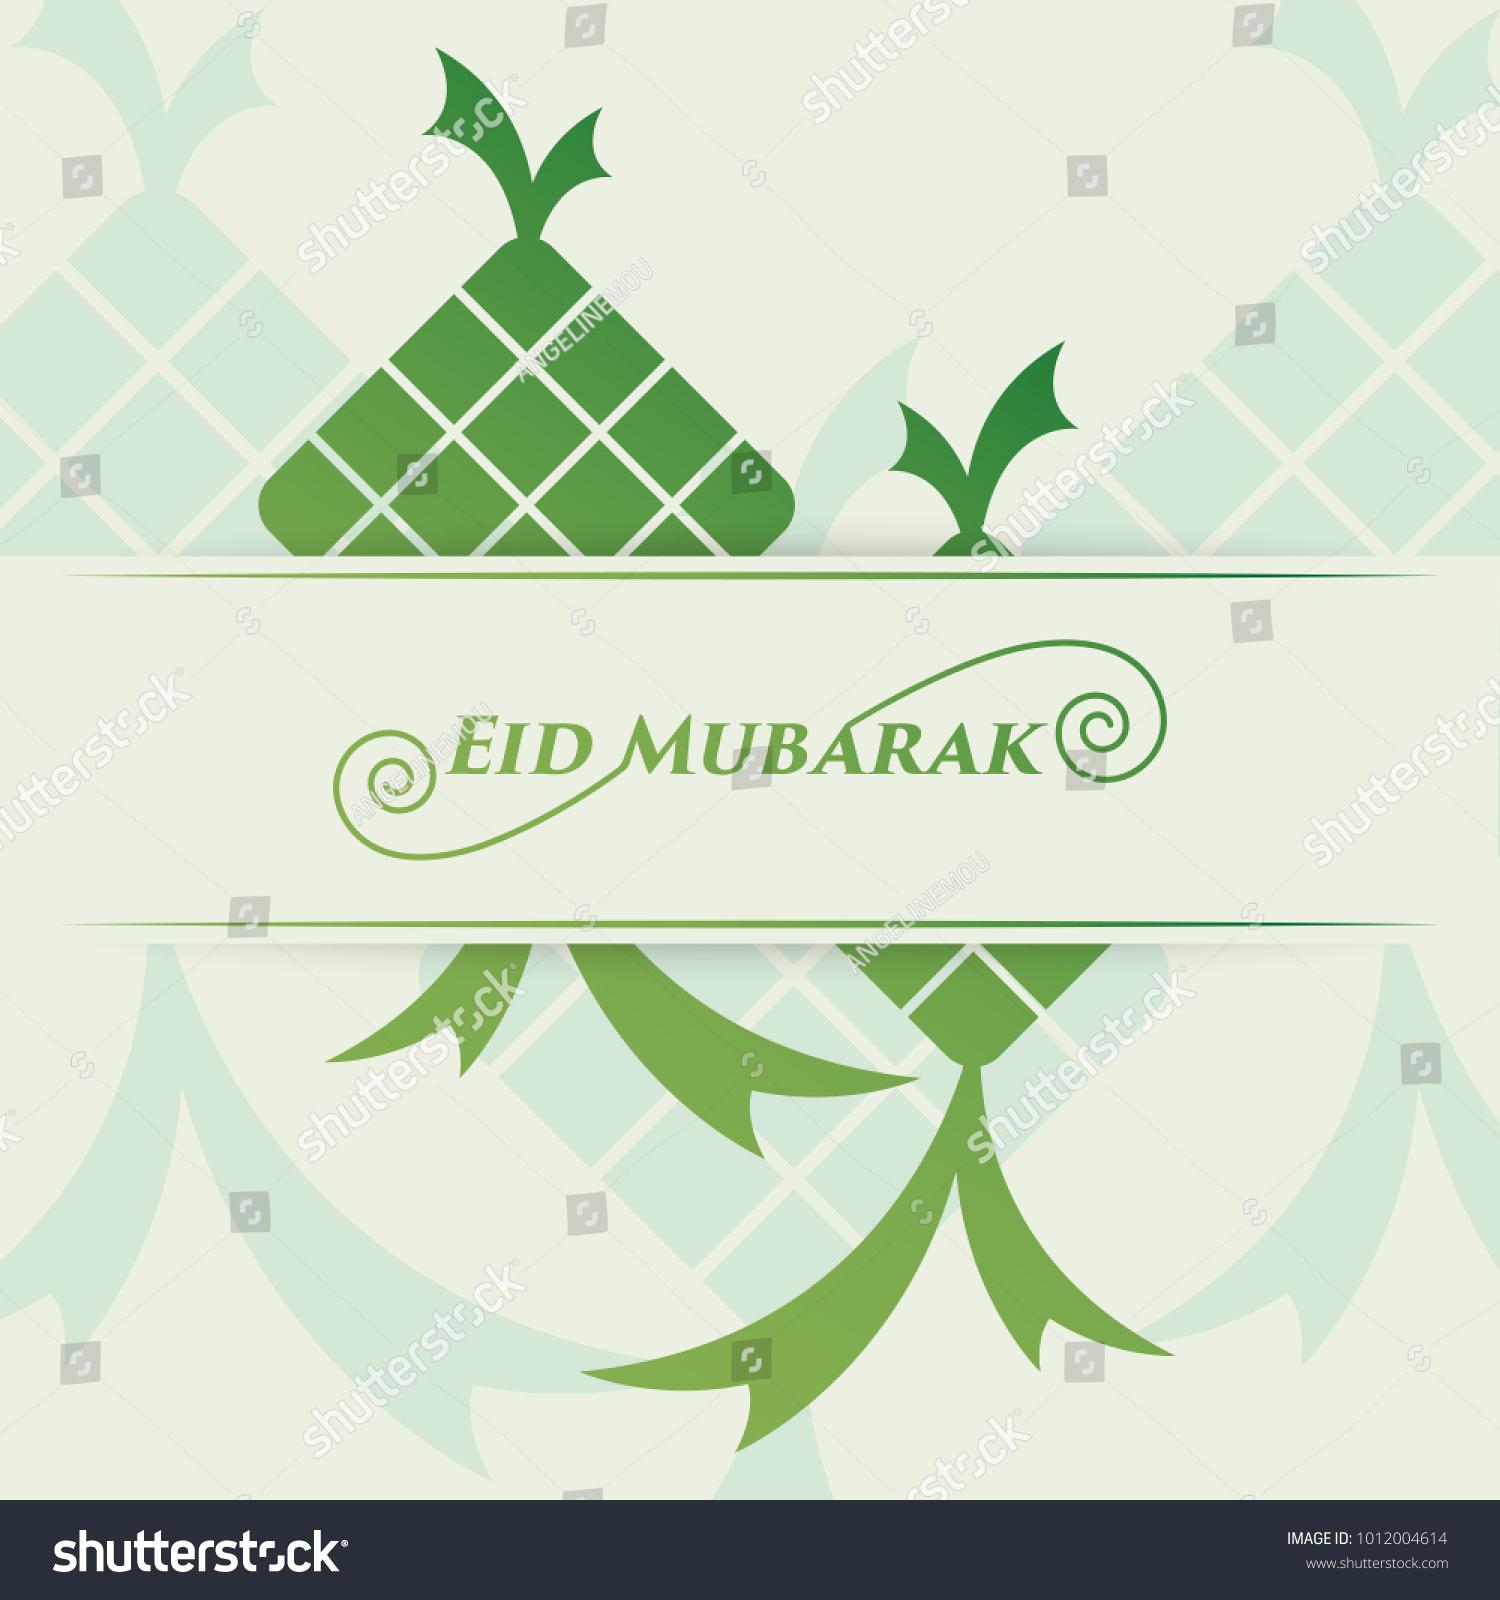 Eid mubarak islamic greeting card cover stock vector 1012004614 eid mubarak islamic greeting card cover stock vector 1012004614 shutterstock kristyandbryce Image collections